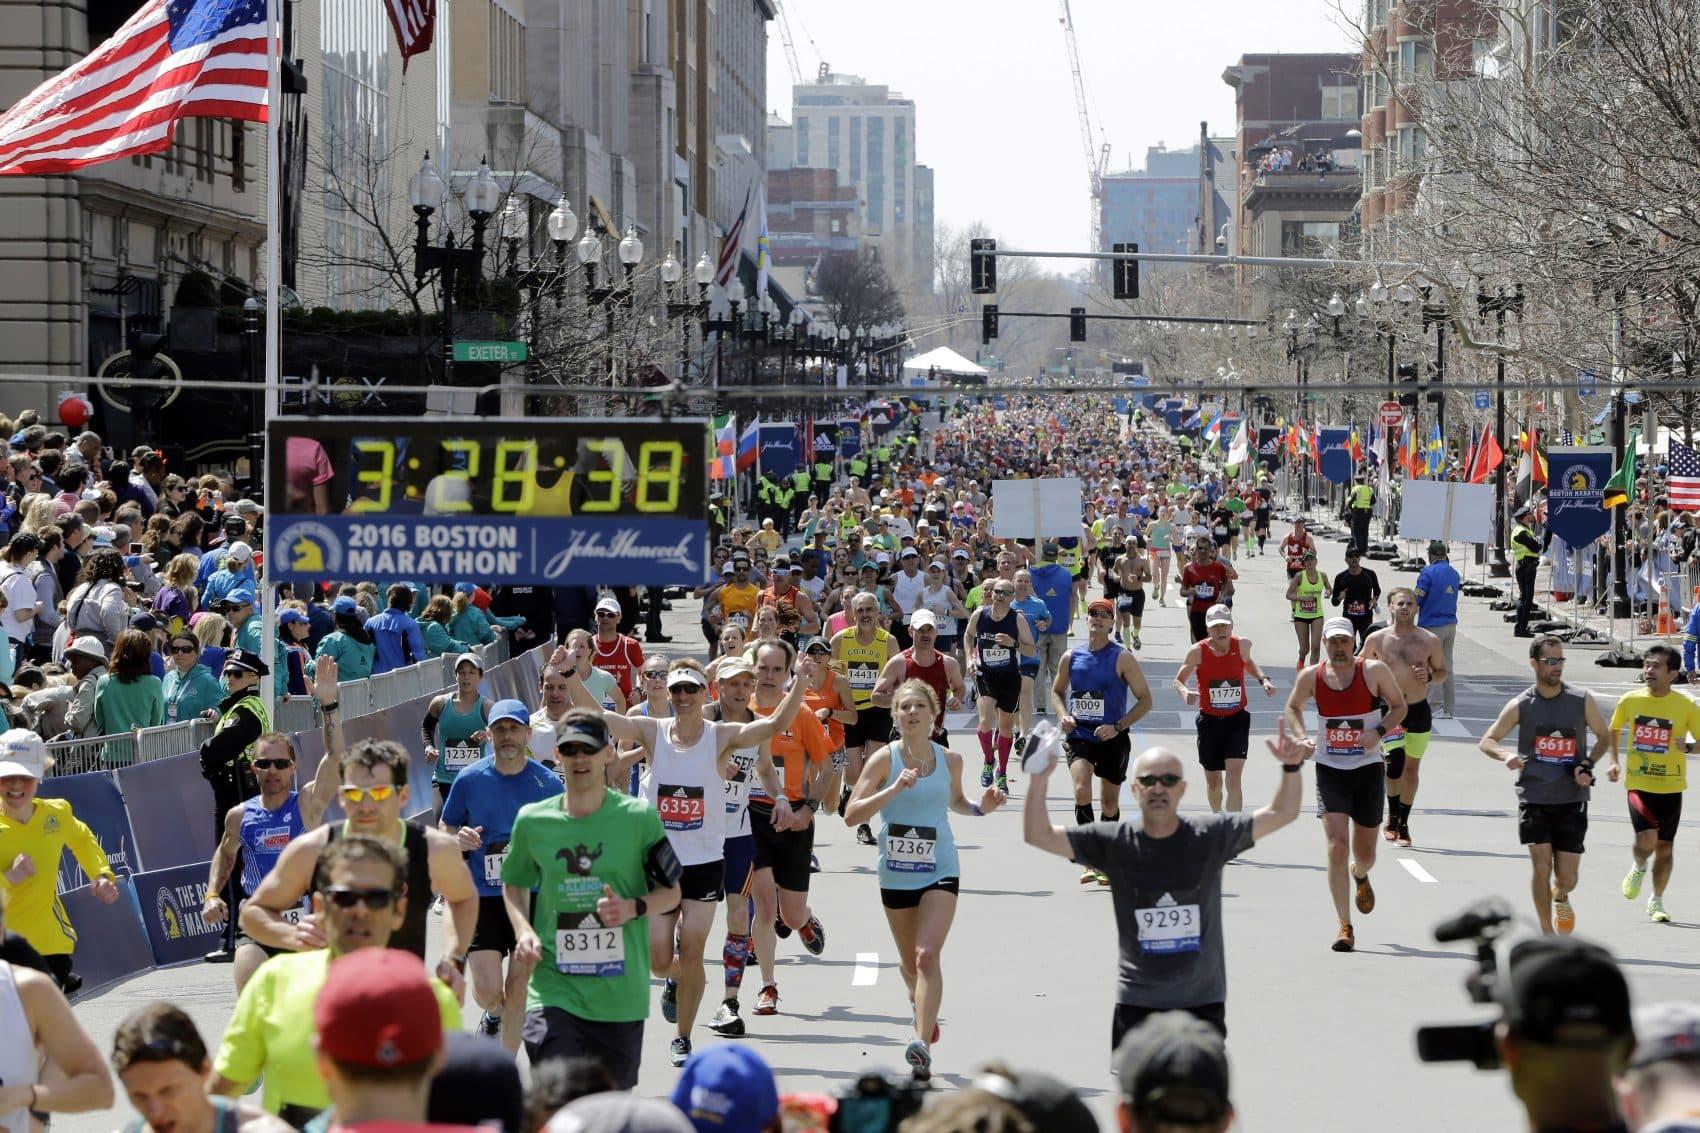 Runners approach the finish line of the 120th Boston Marathon on Monday, April 18, 2016, in Boston. (Elise Amendola/AP Photo)